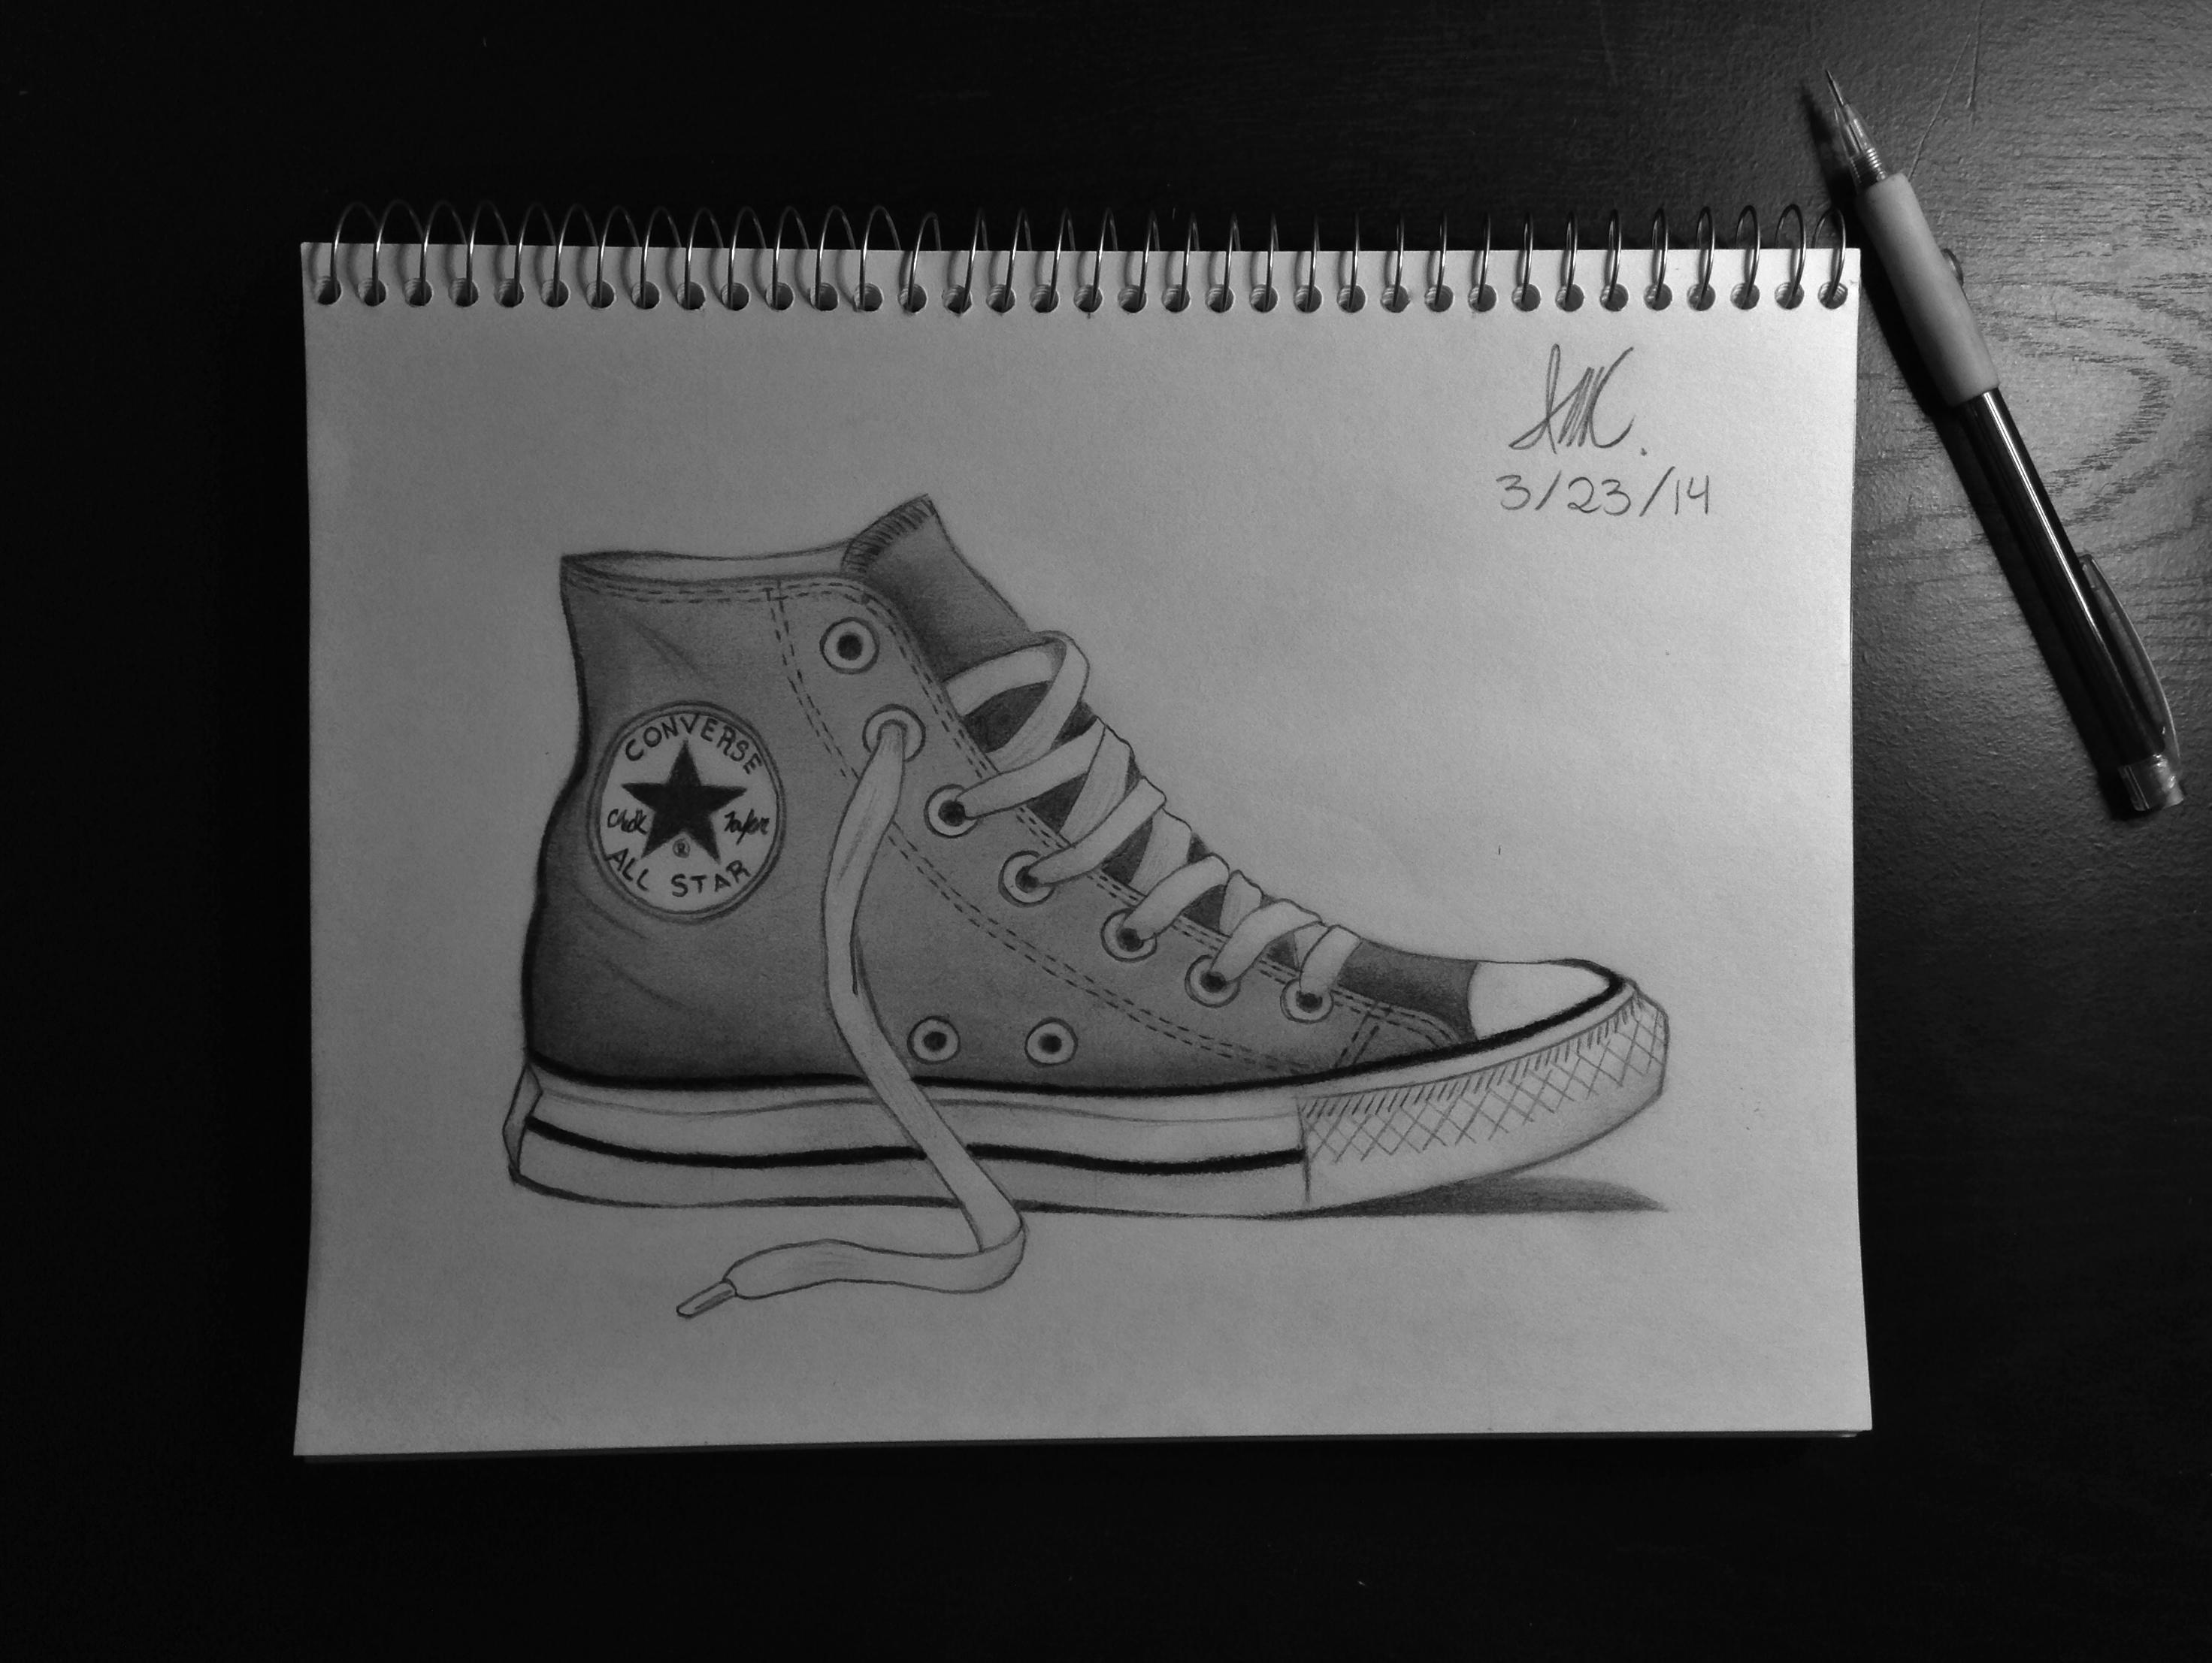 Drawn shoe converse Pinterest Converse Converse shoe My